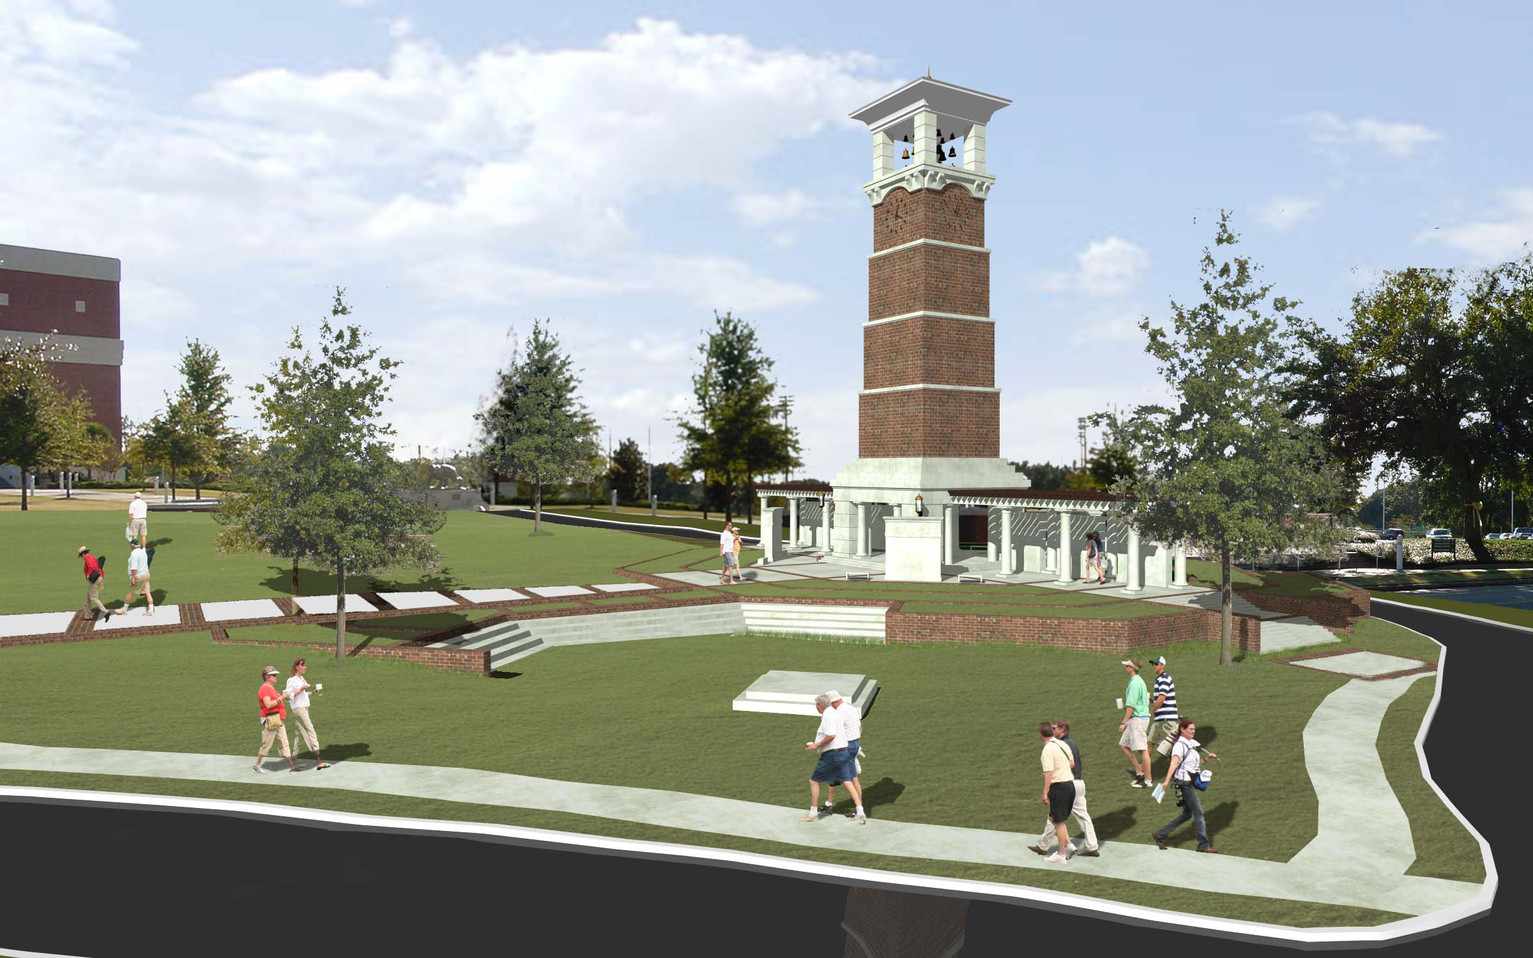 University of South Alabama Tower